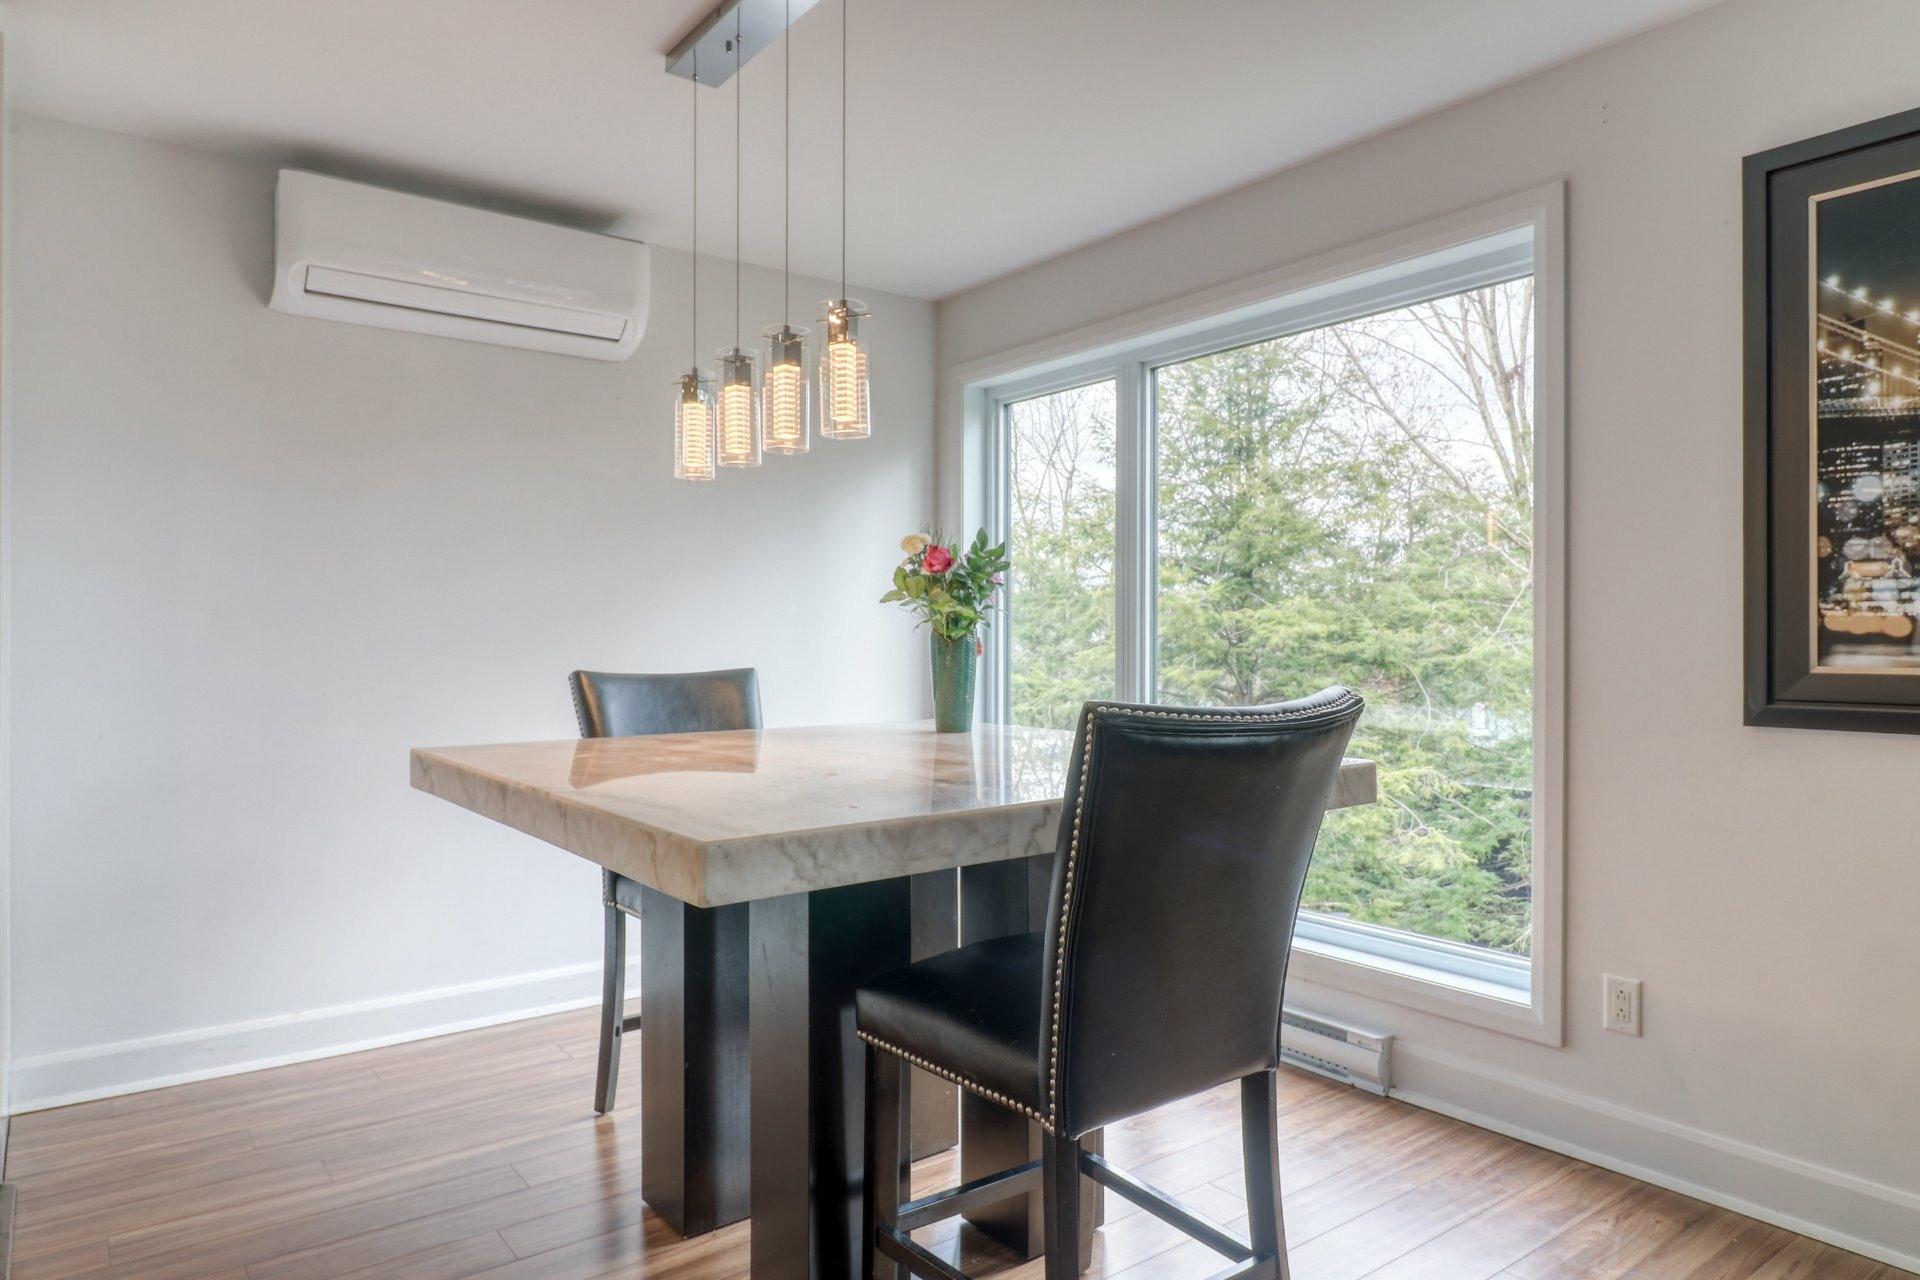 image 7 - Apartment For sale Blainville - 8 rooms